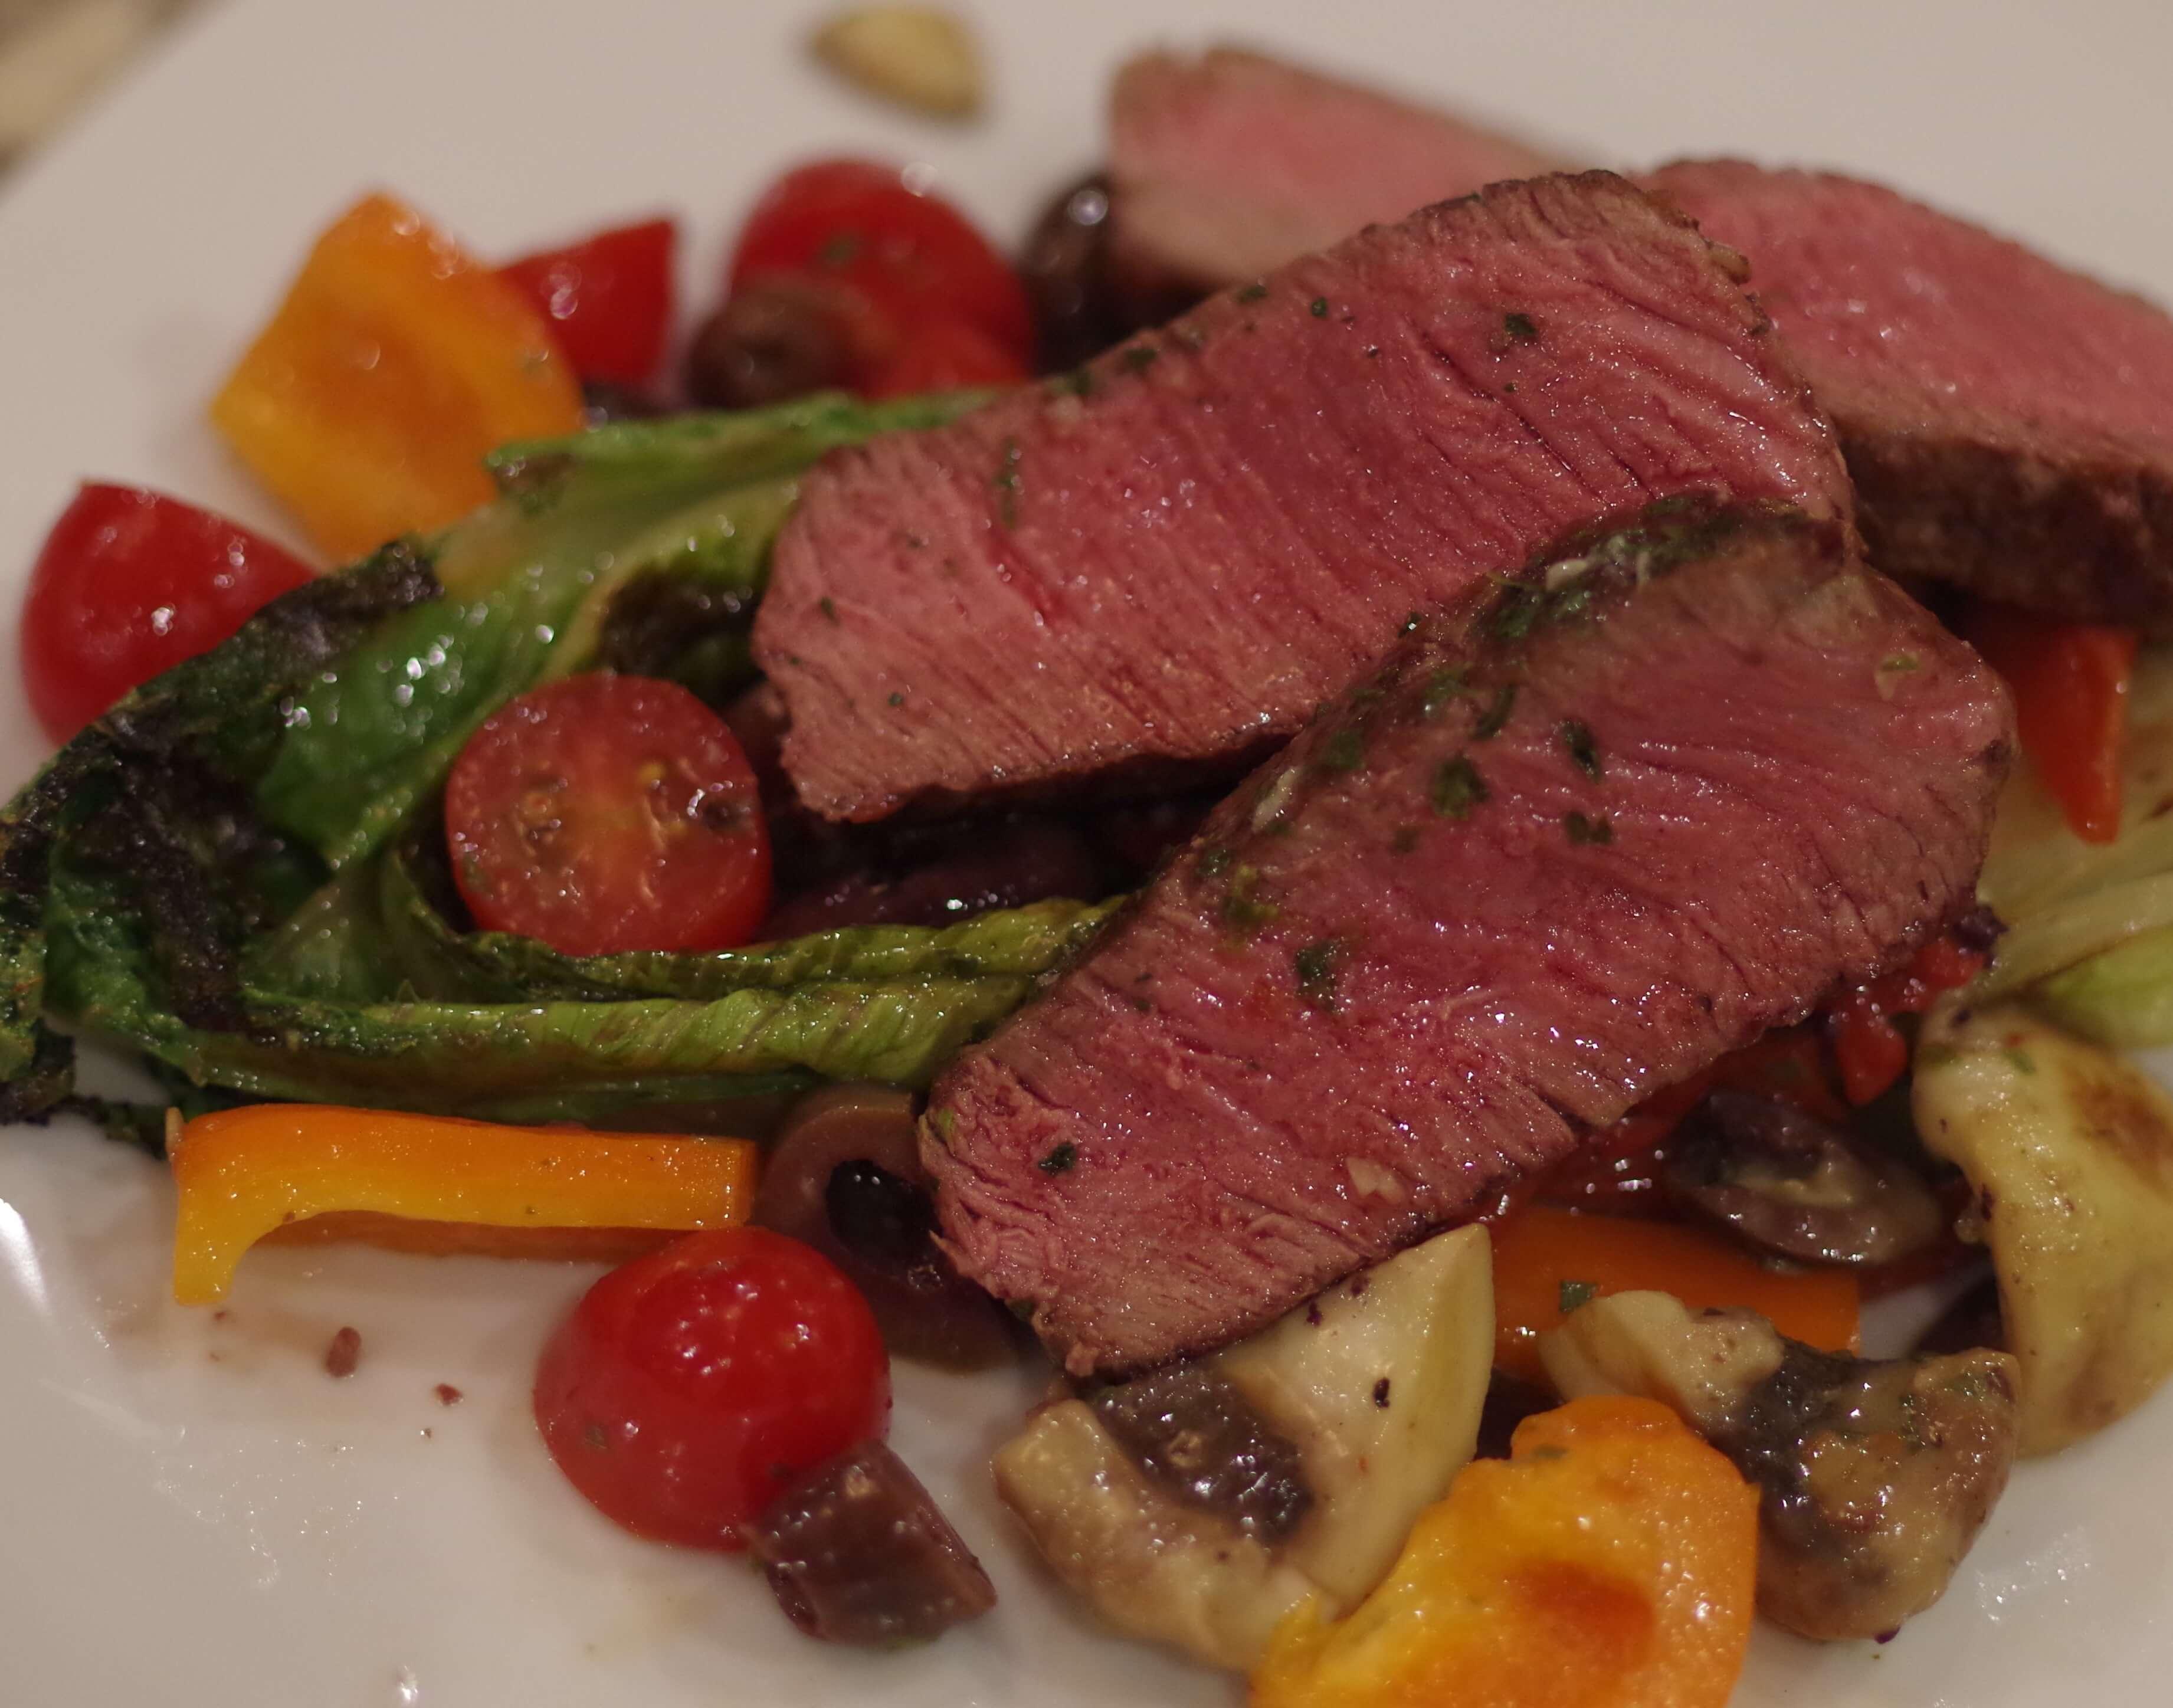 Tuscan Salad with Steak